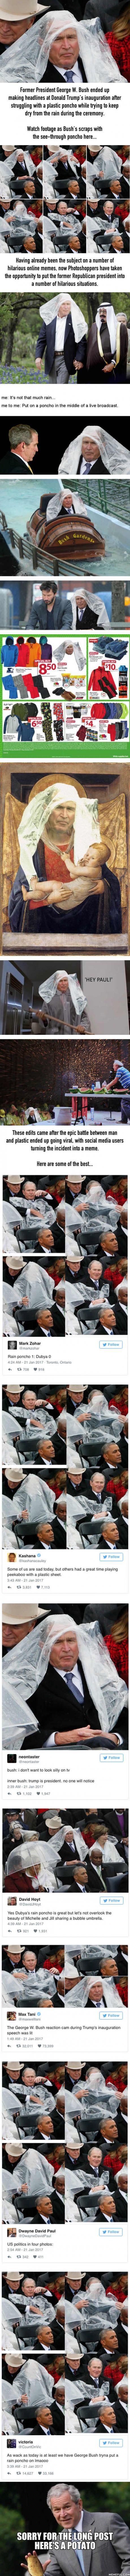 George Bush's Poncho Fight Got The Photoshop Treatment It Deserved